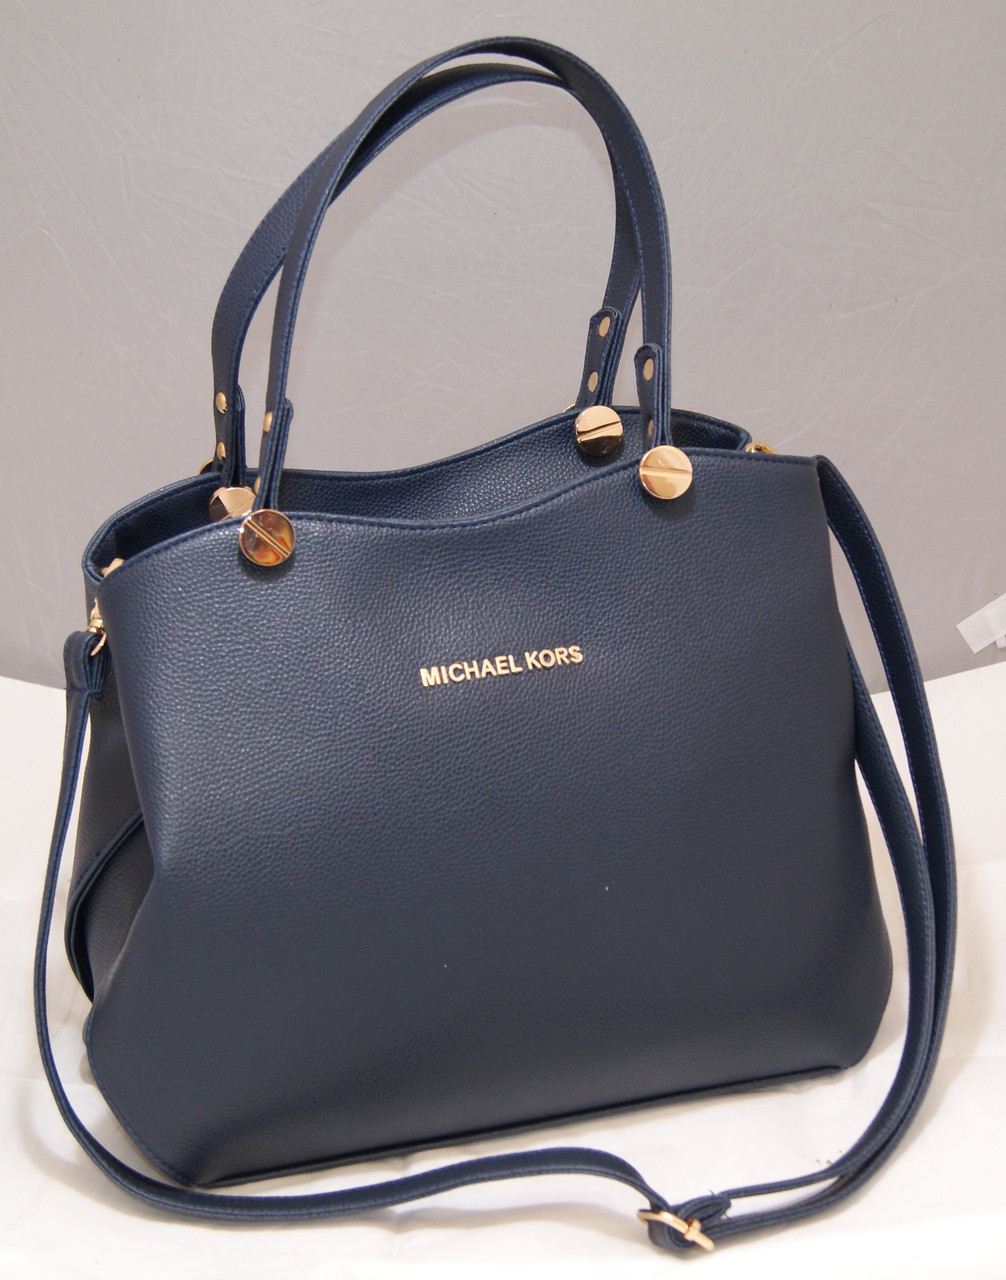 64be8ee6fbb4 Женская сумка Michael Kors, цвет синий Майкл Корс MK: продажа, цена ...